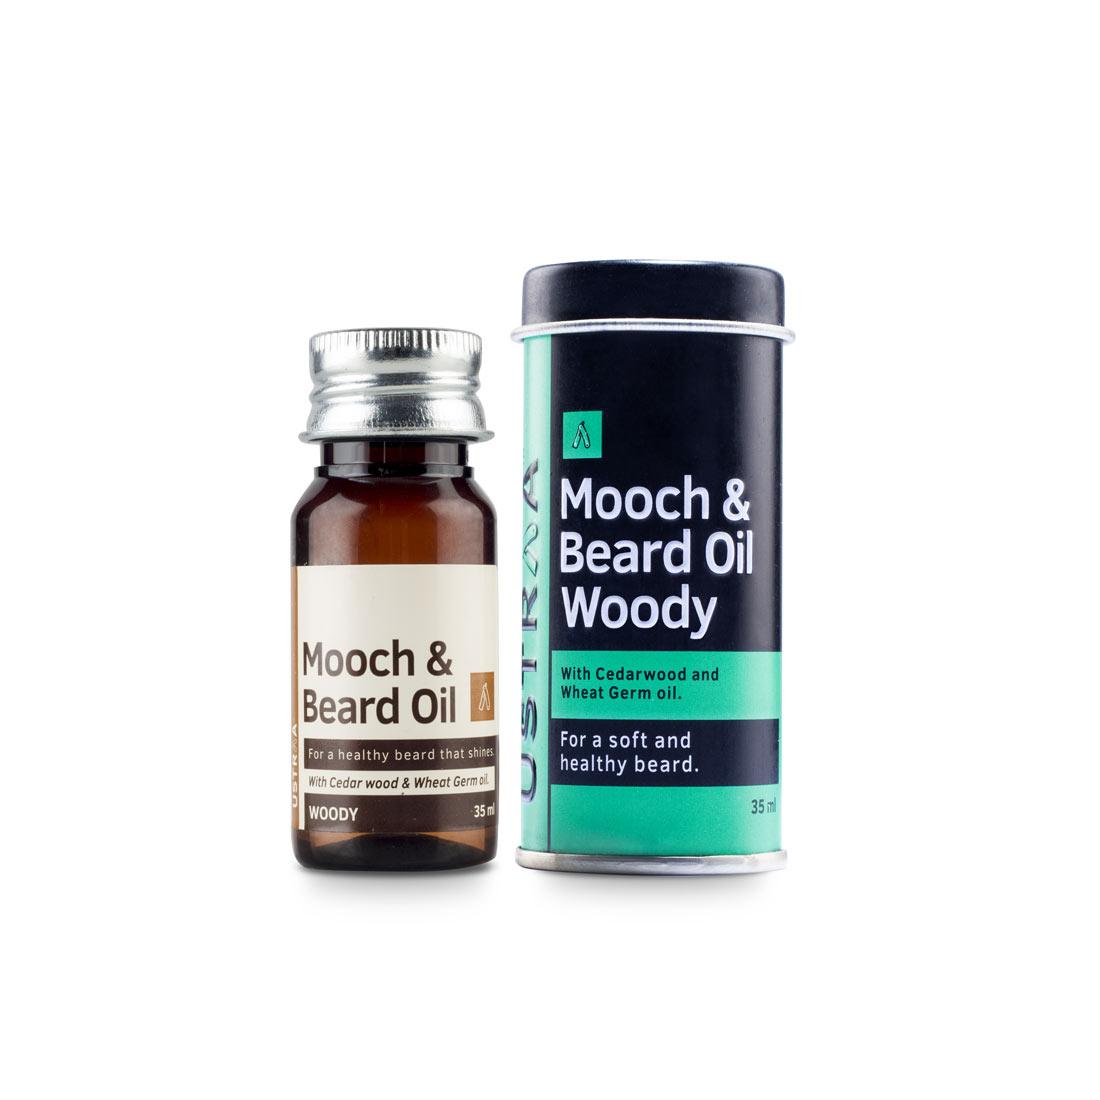 Ustraa | Mooch and Beard Oil Woody 35ml